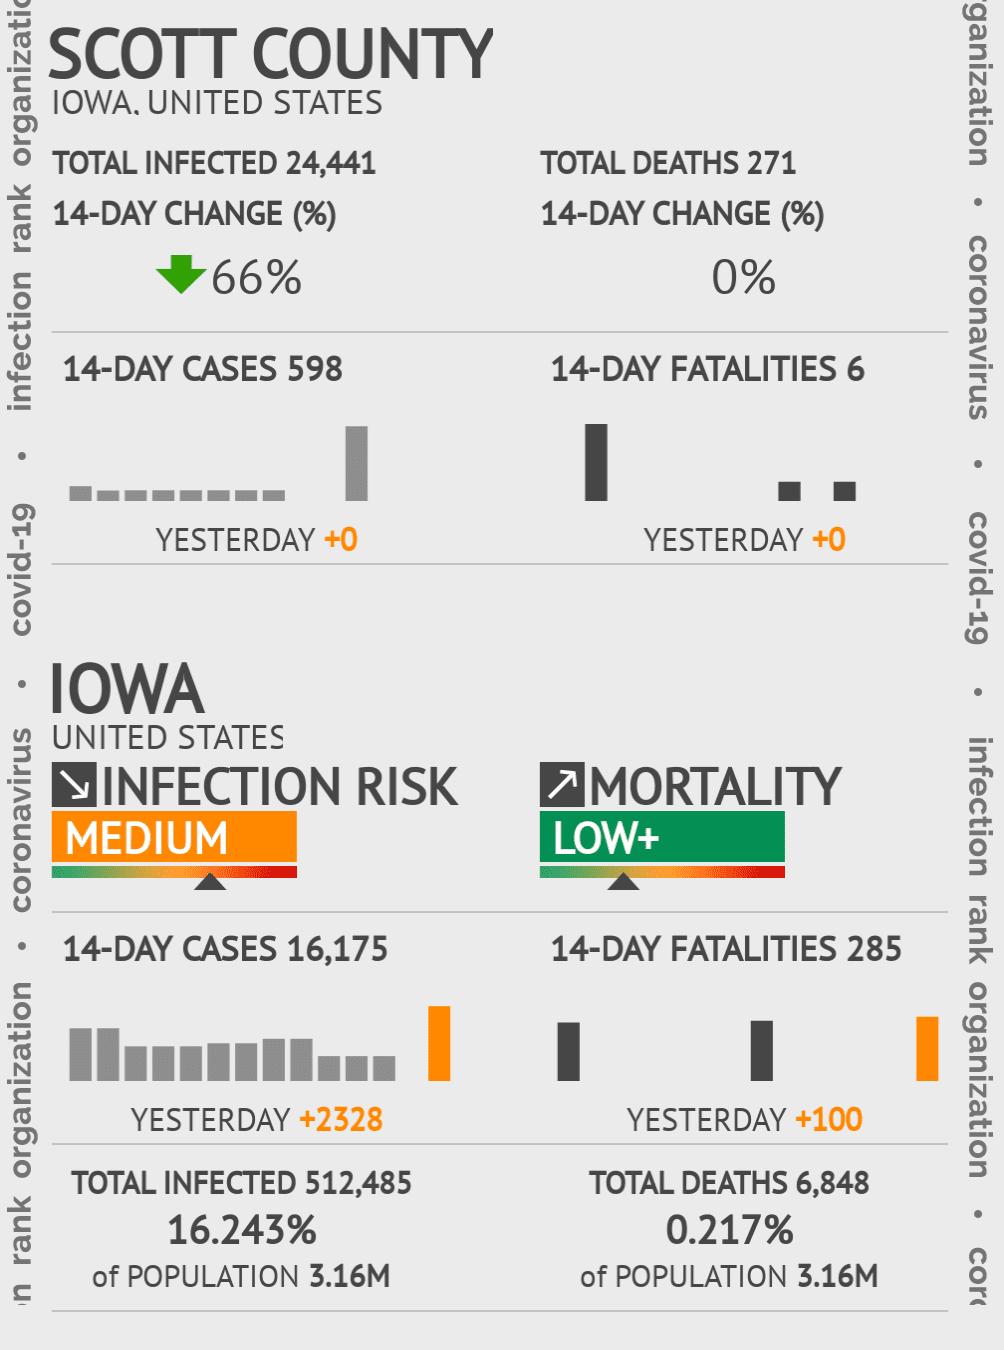 Scott County Coronavirus Covid-19 Risk of Infection on March 23, 2021